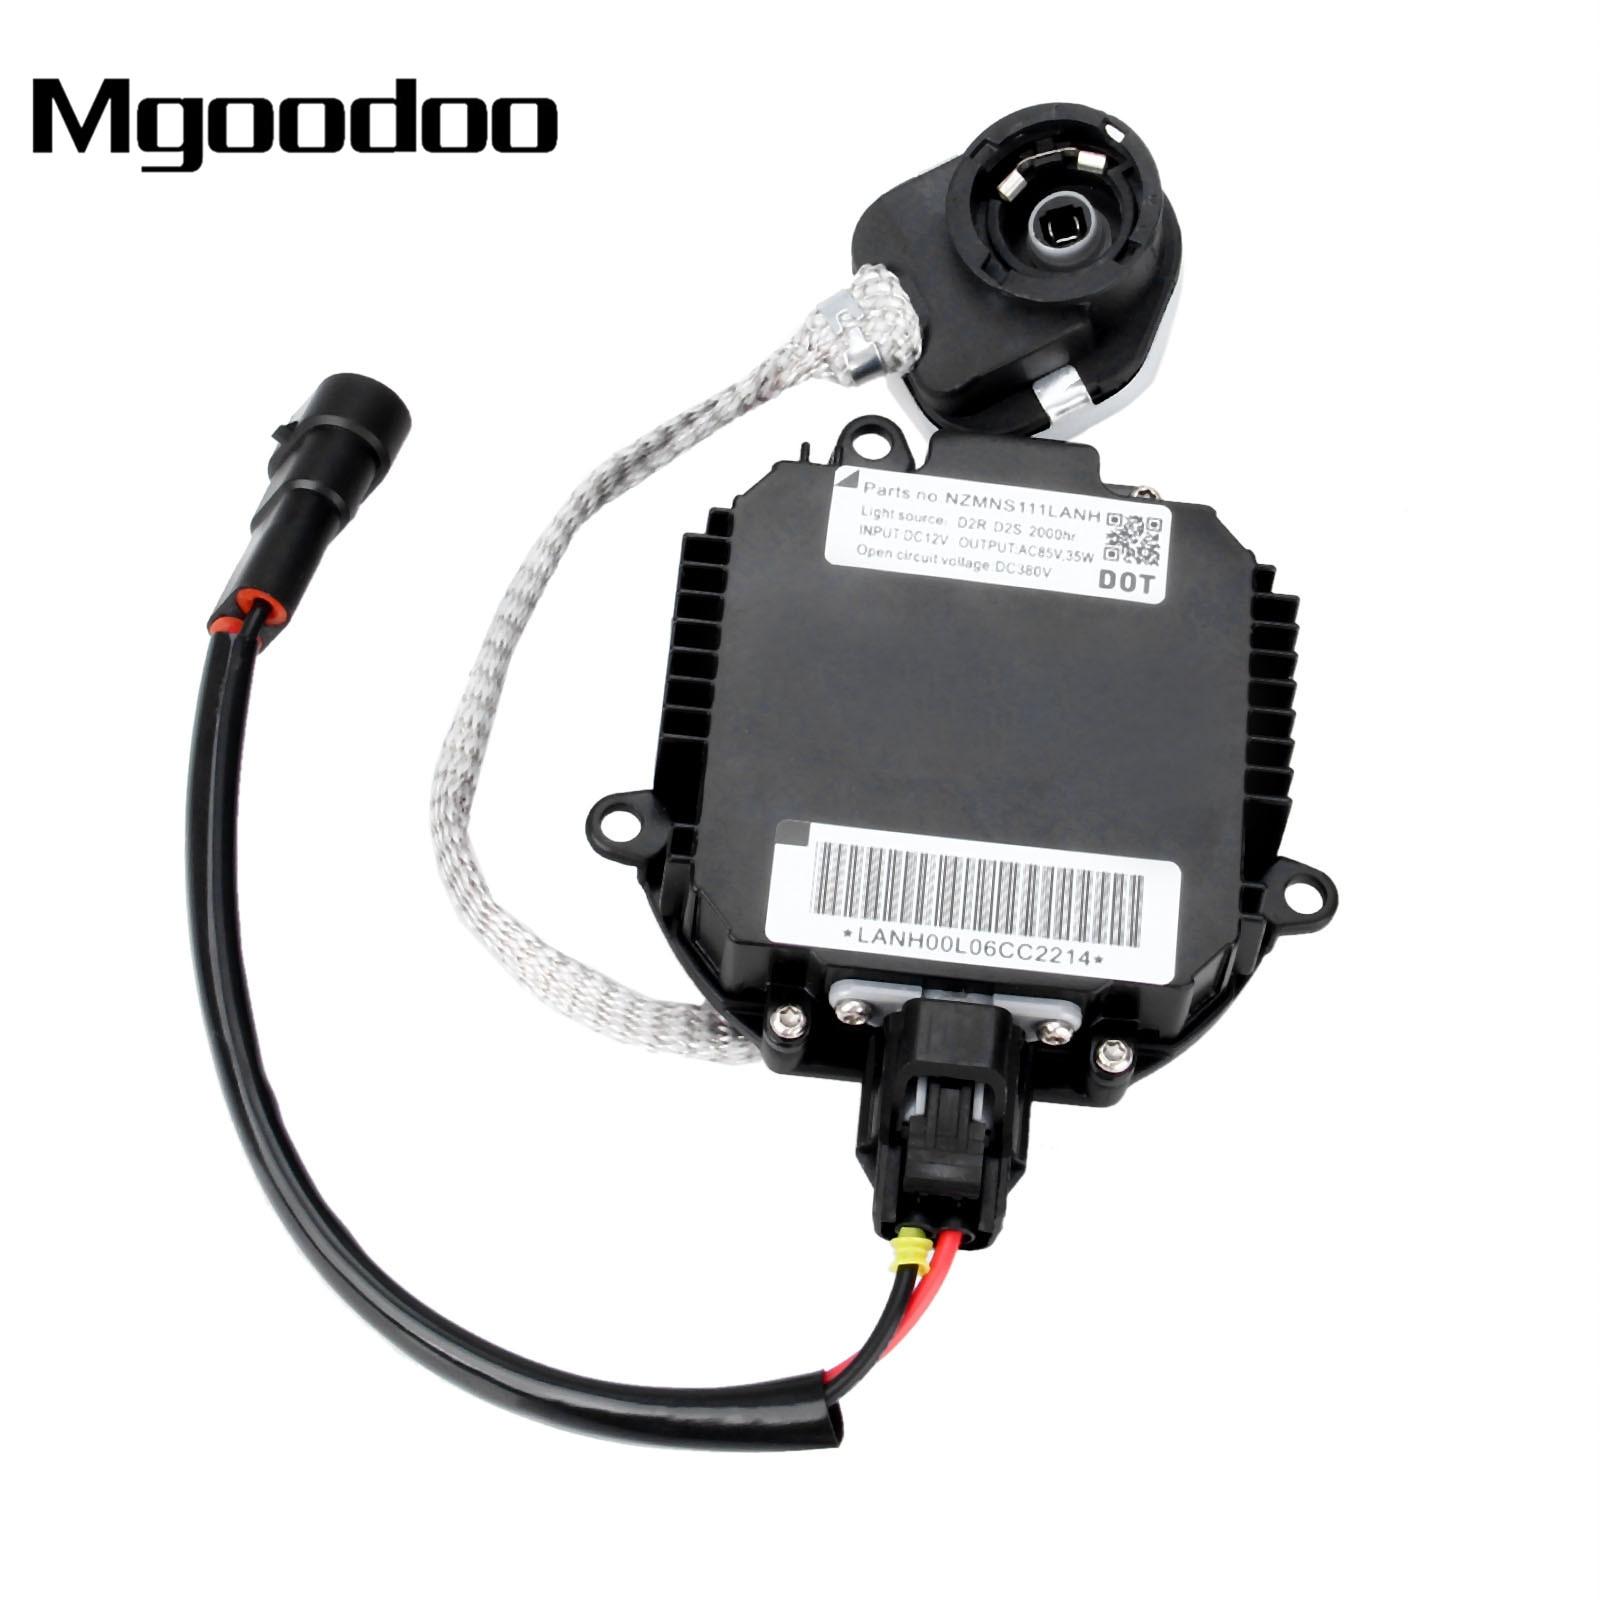 2013 2014 Matsushita GEN-5 Infiniti G35 Xenon HID Headlamp Ballast Control OEM